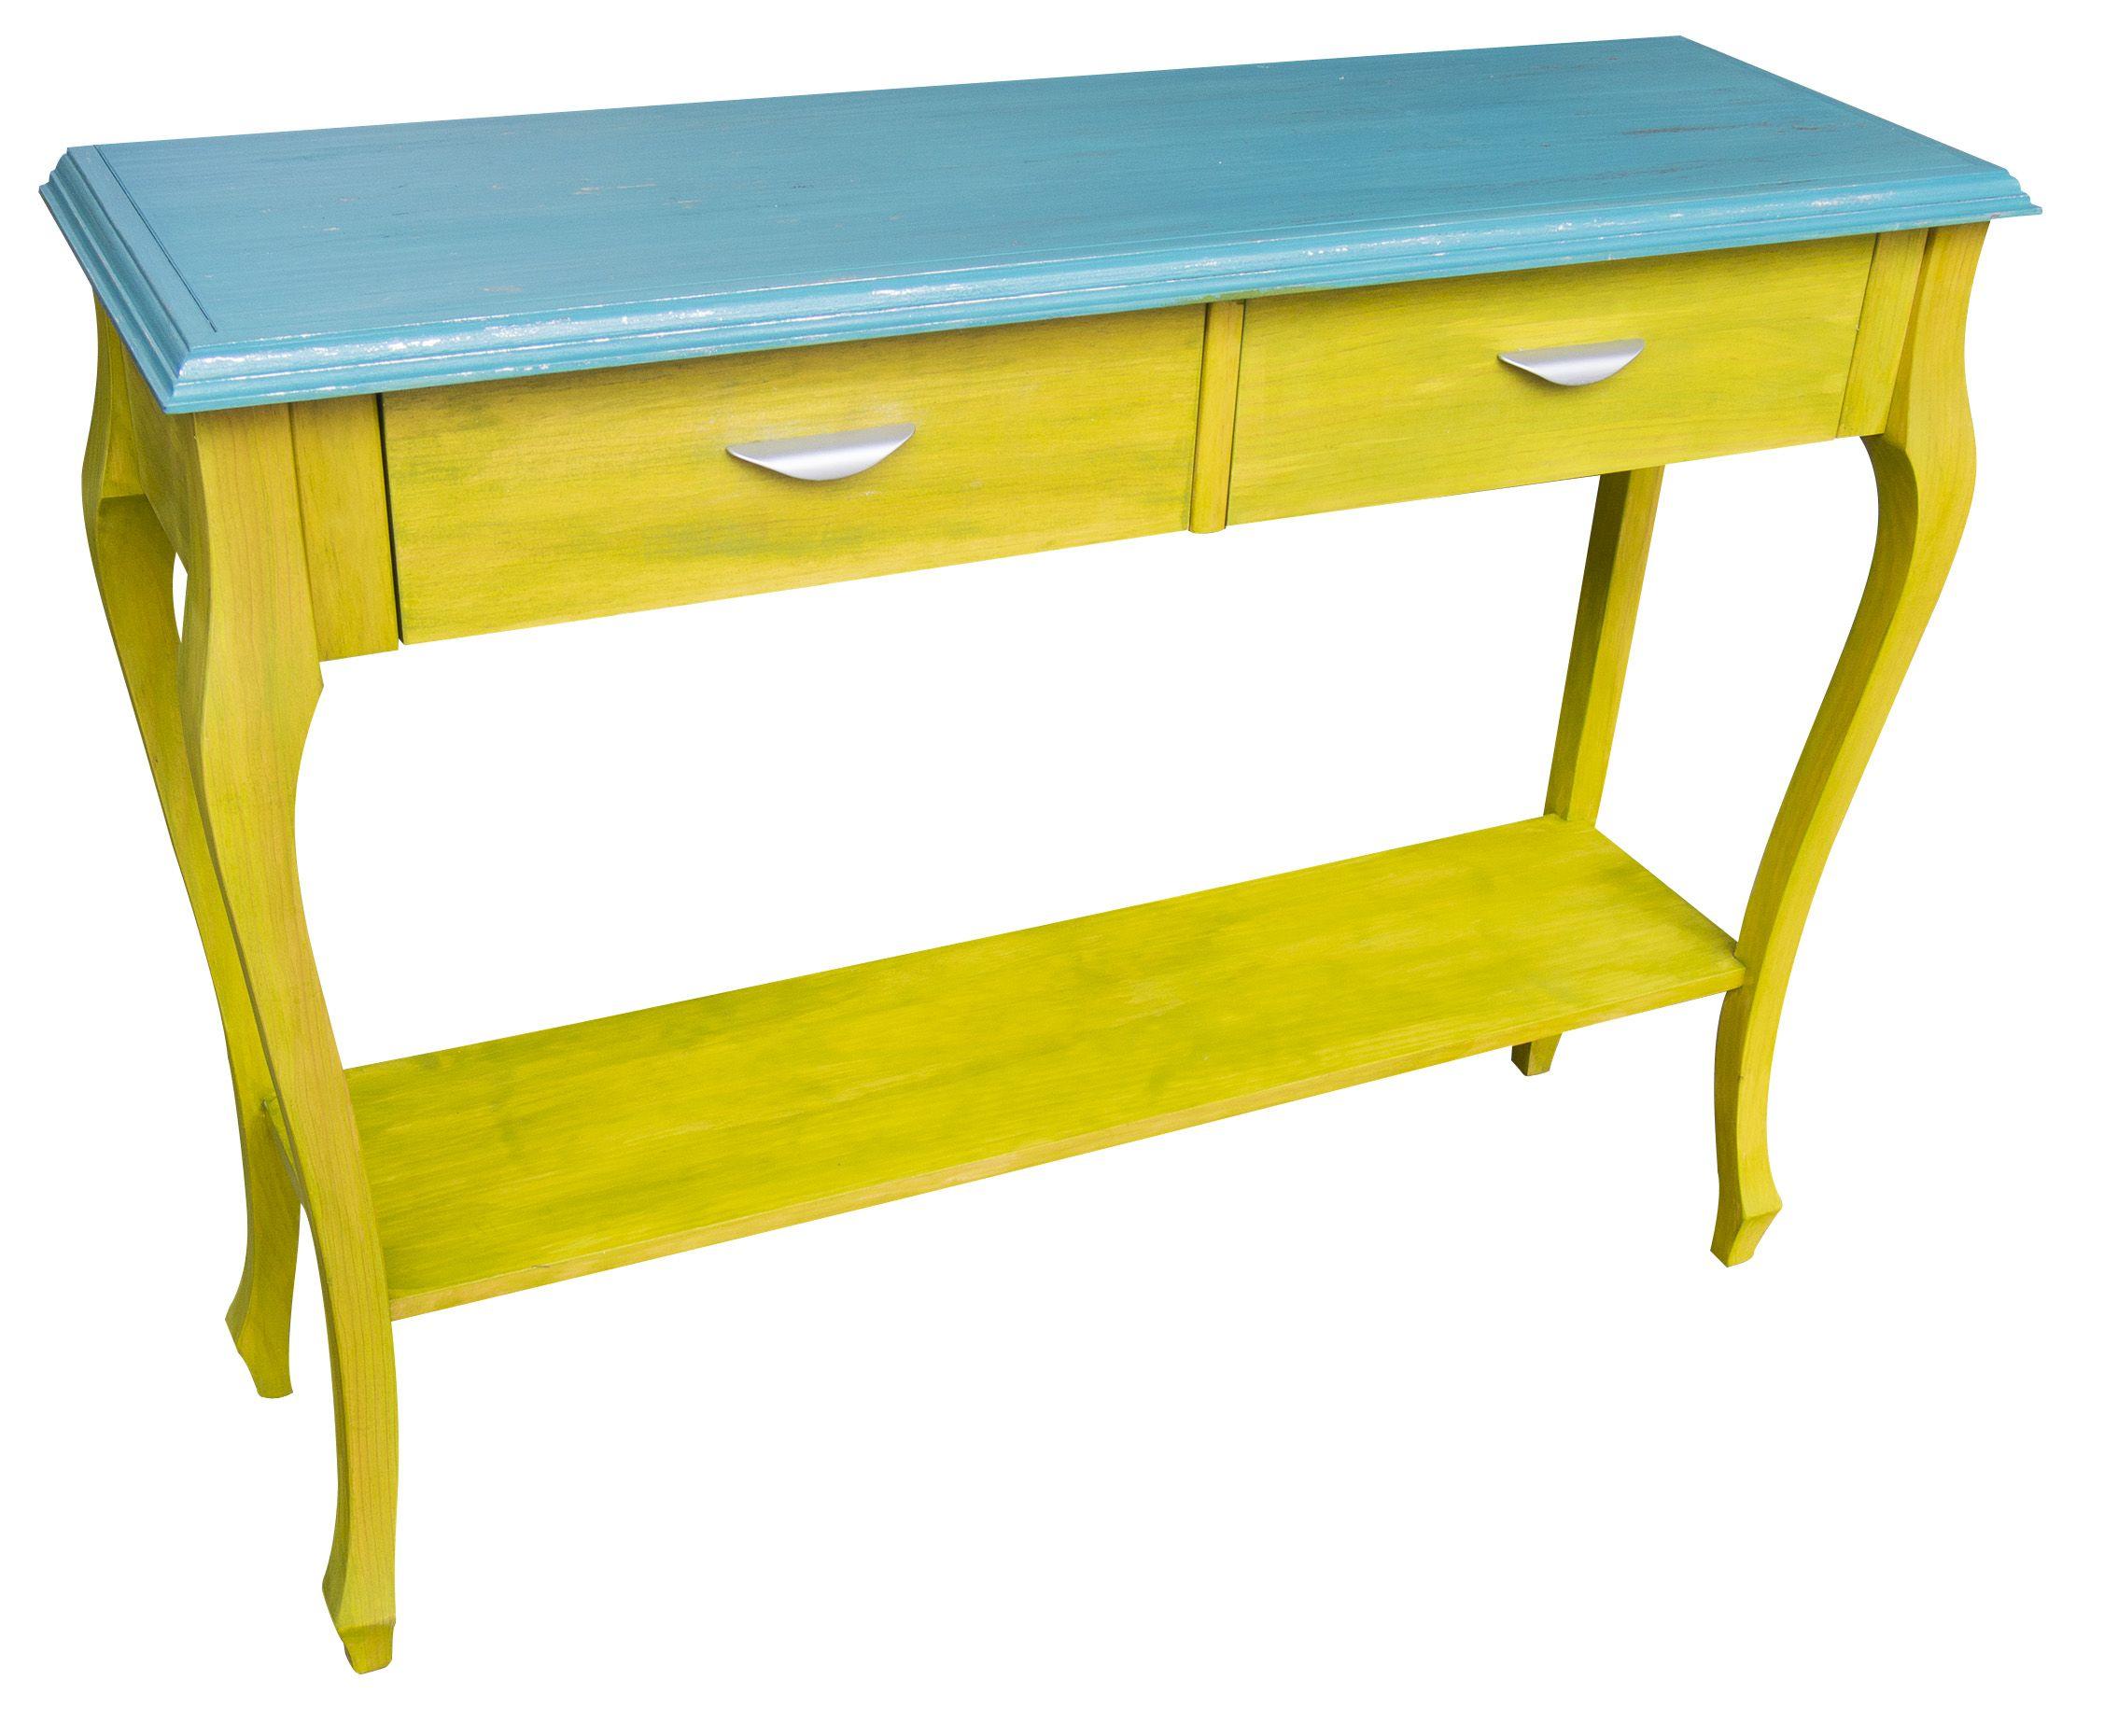 Consola Amarillo Verdoso Con Tapa Azul Turquesa Y Pan De Plata  # Muebles Vibbo Malaga